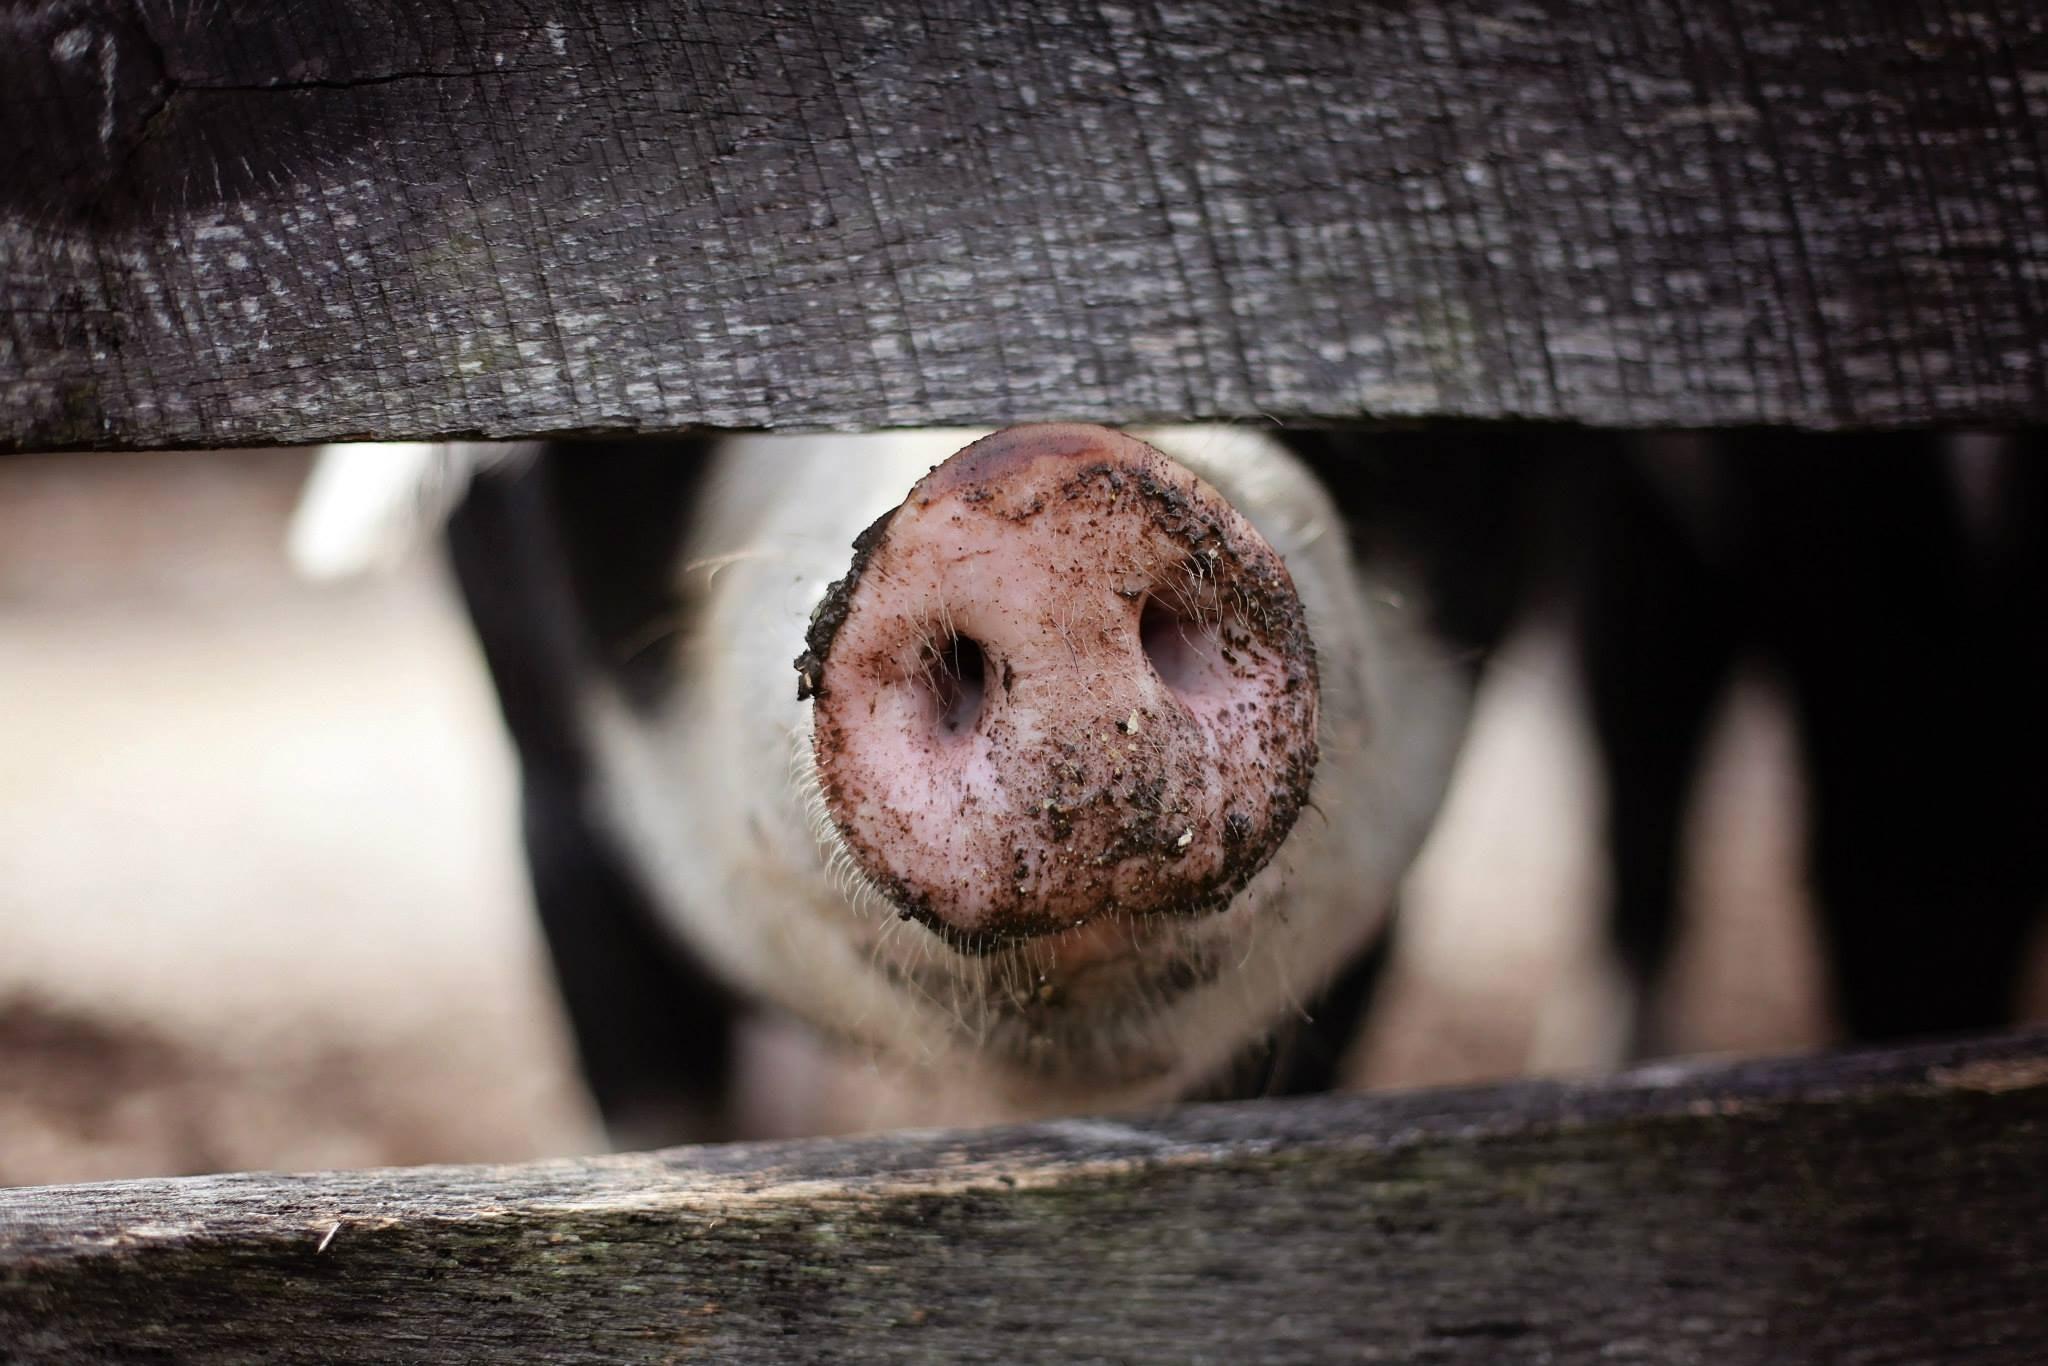 animal-blur-close-up-185941.jpg